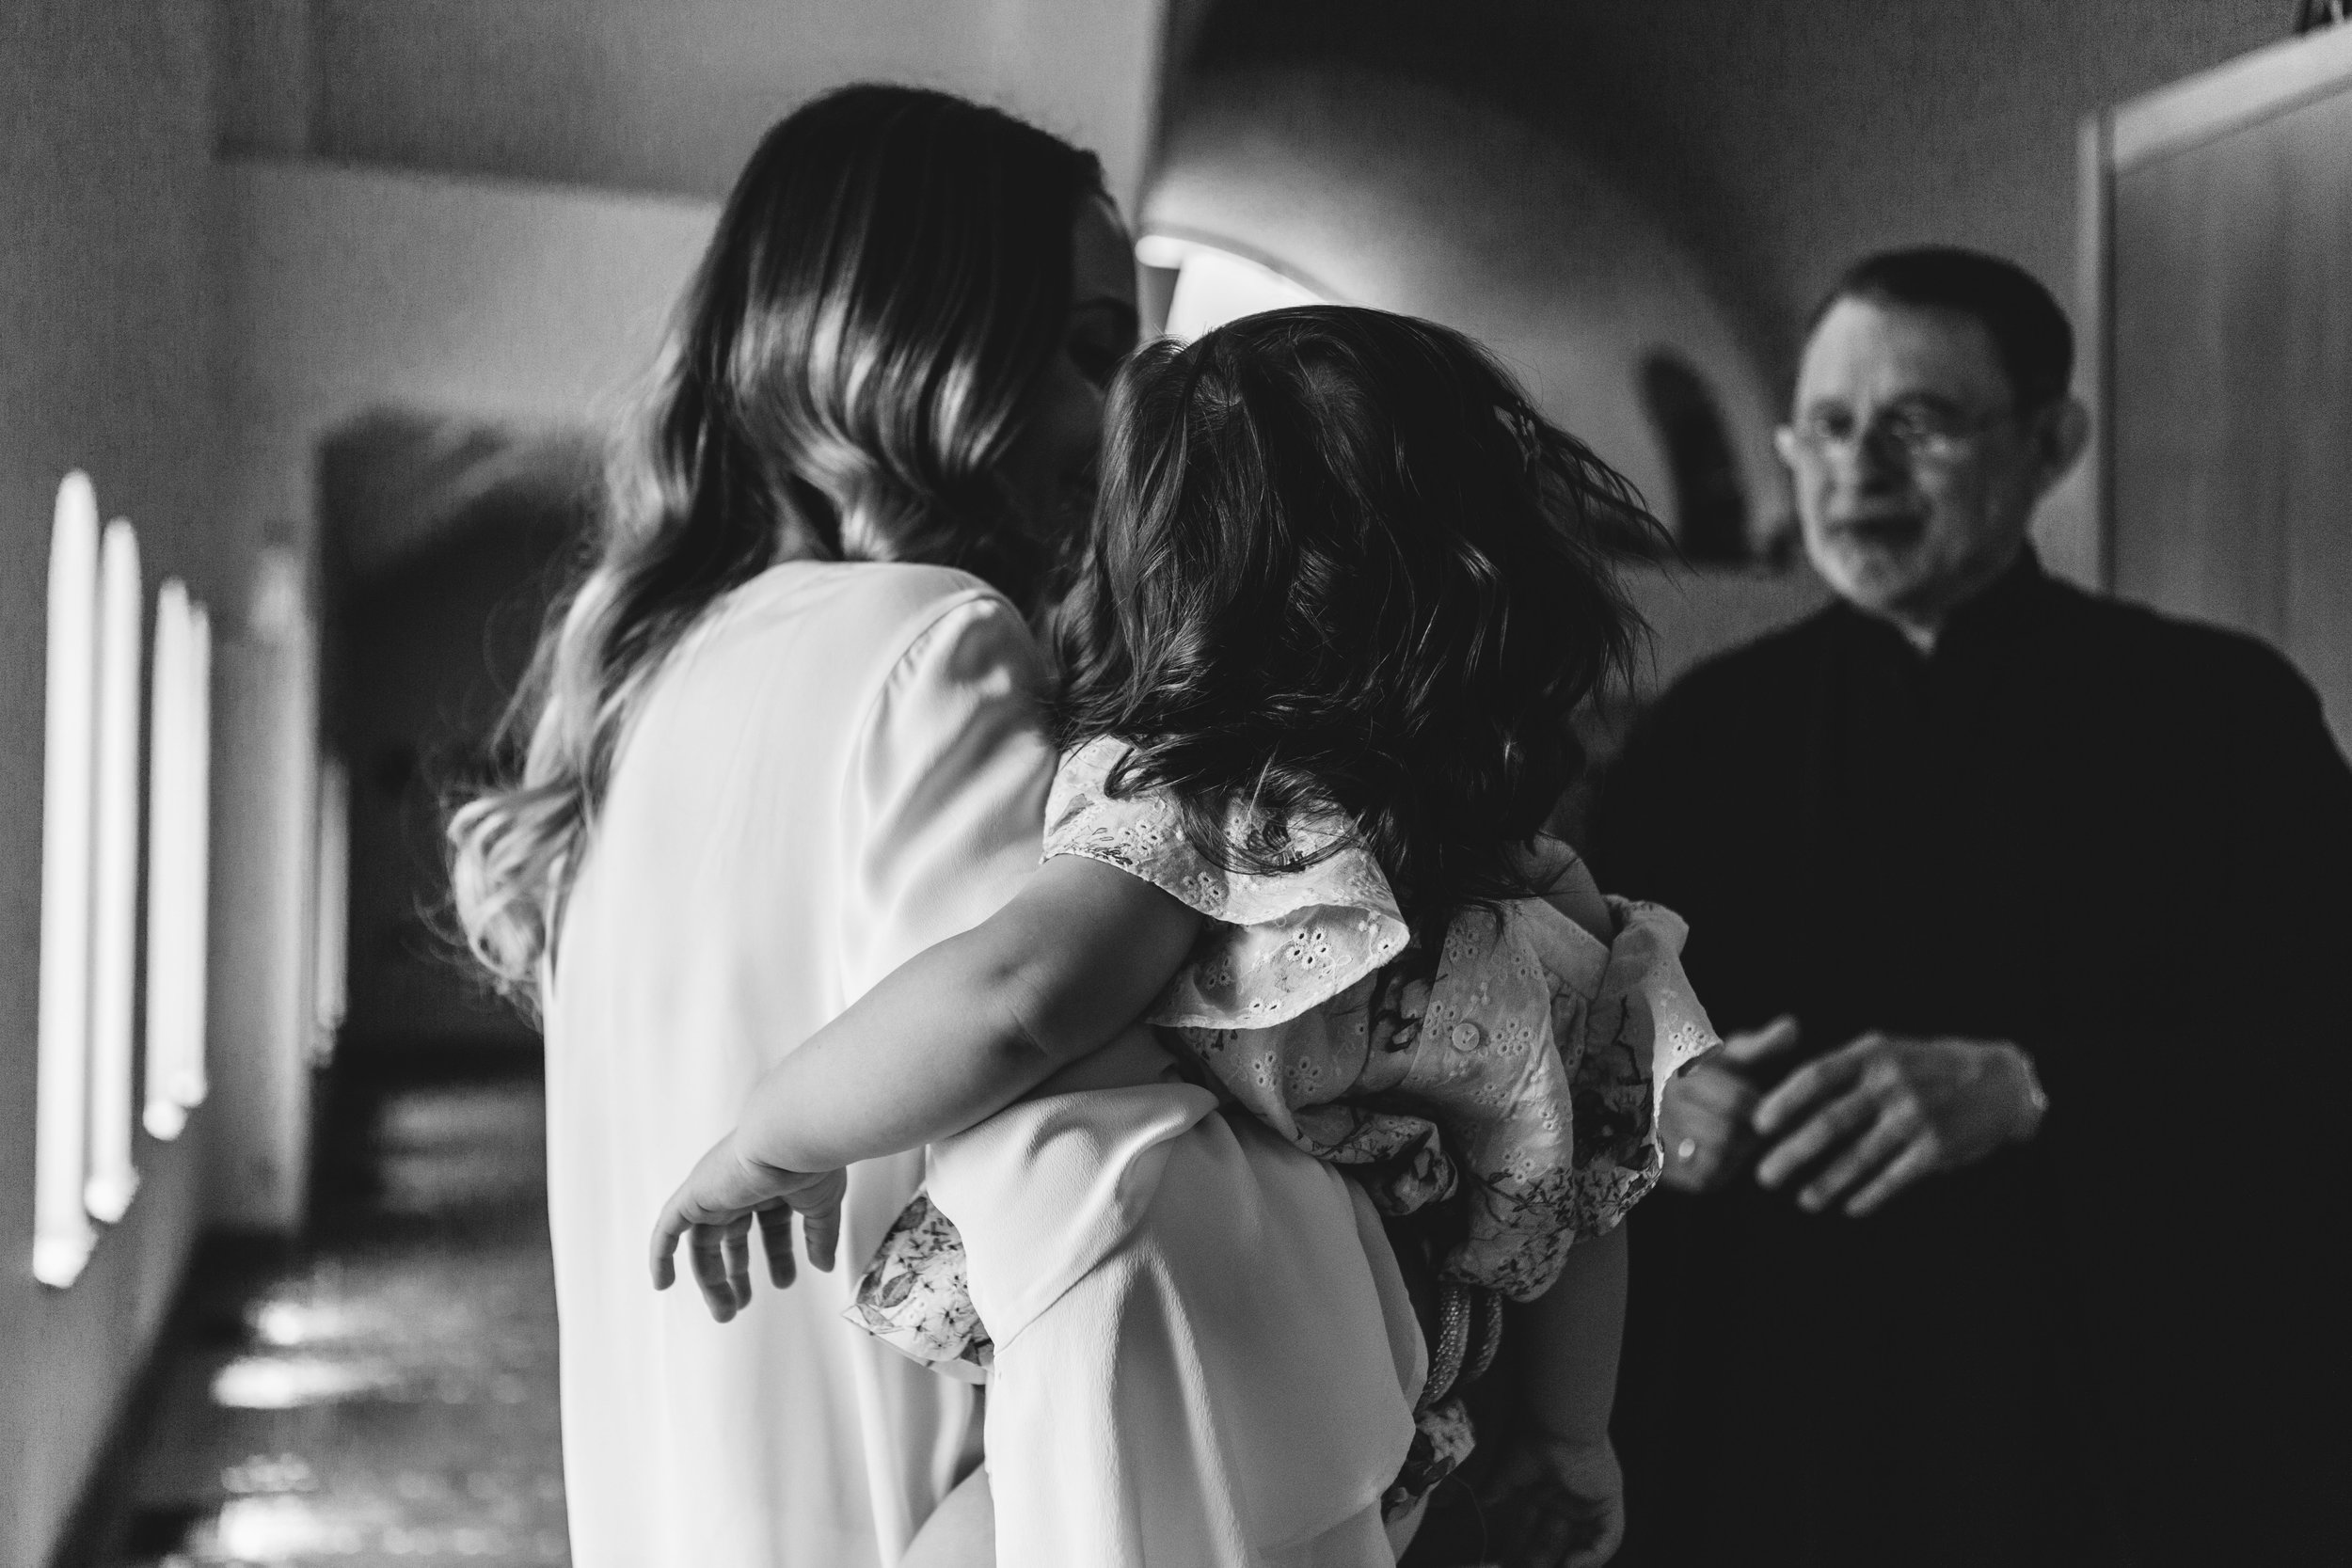 20170625_grace_baptism_8128.jpg